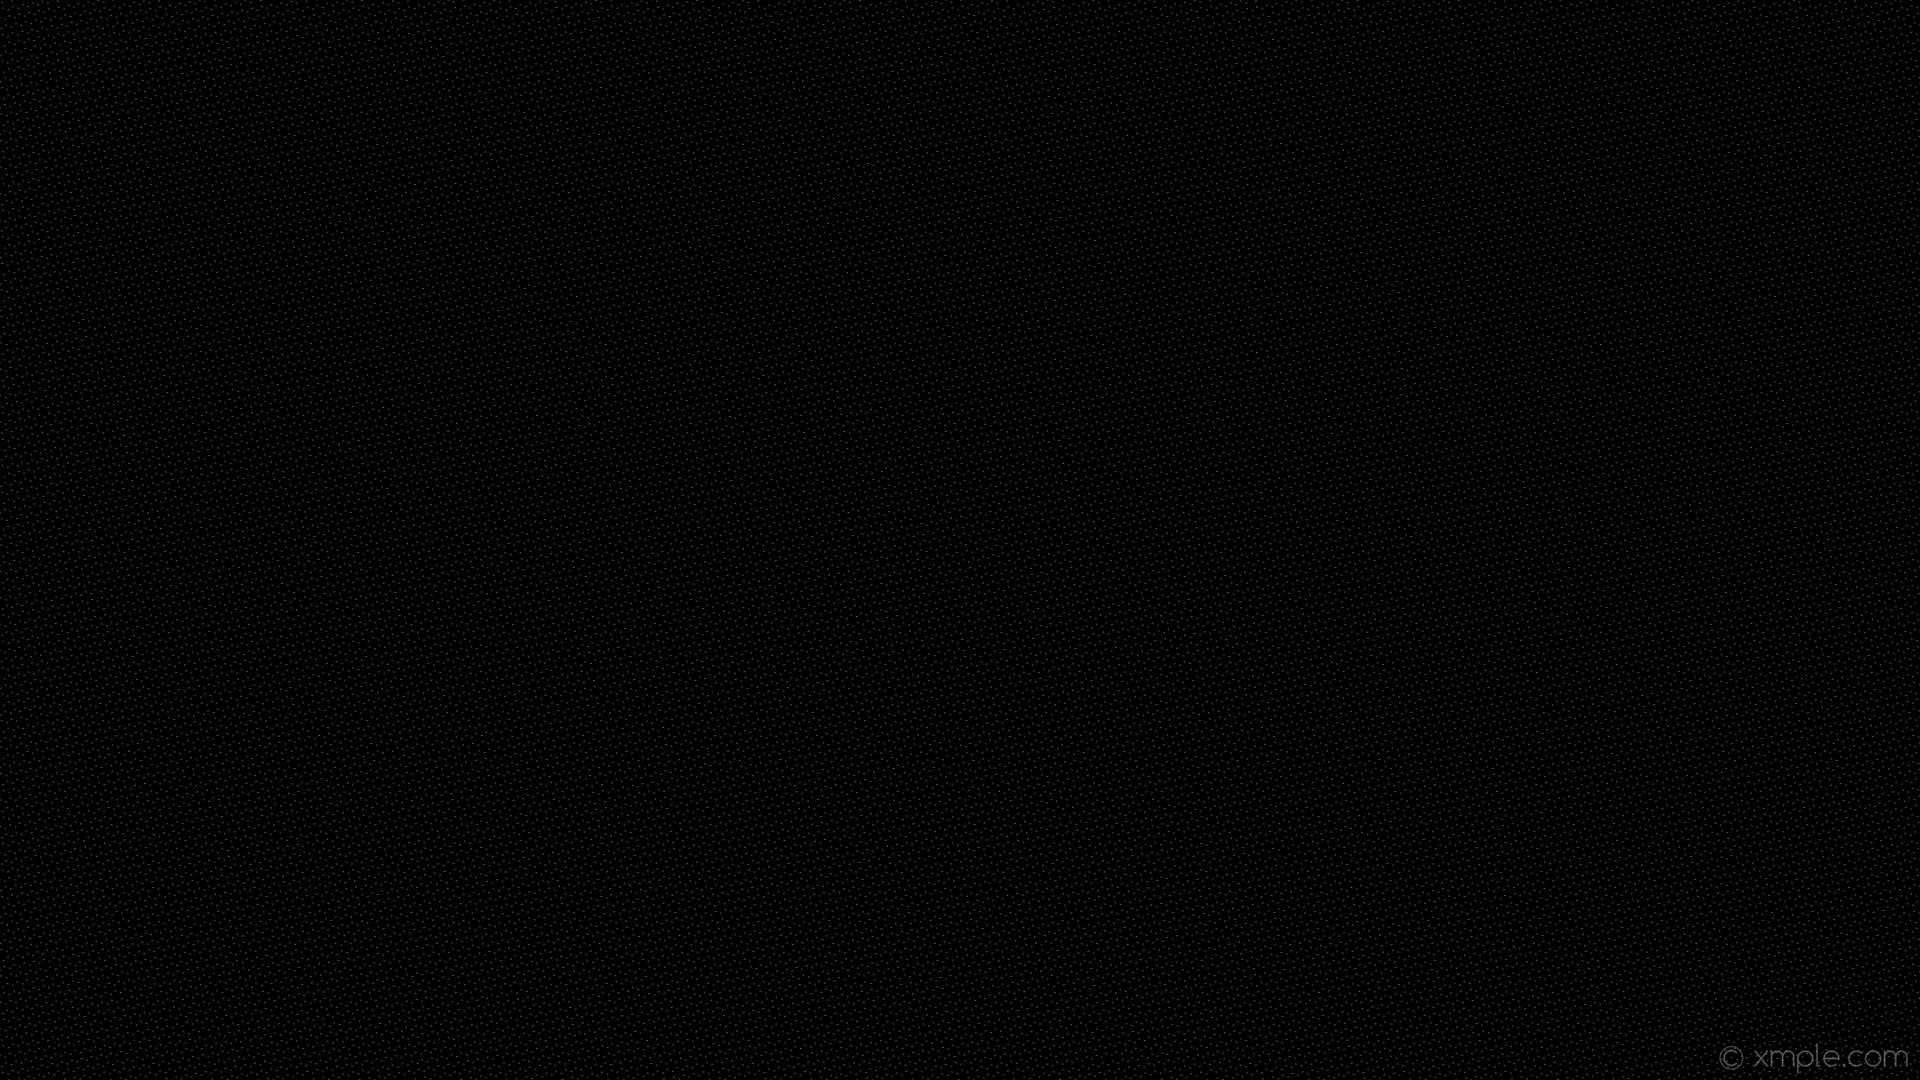 wallpaper black polka hexagon dots brown bisque #ffe4c4 #000000 diagonal  10° 11px 10px